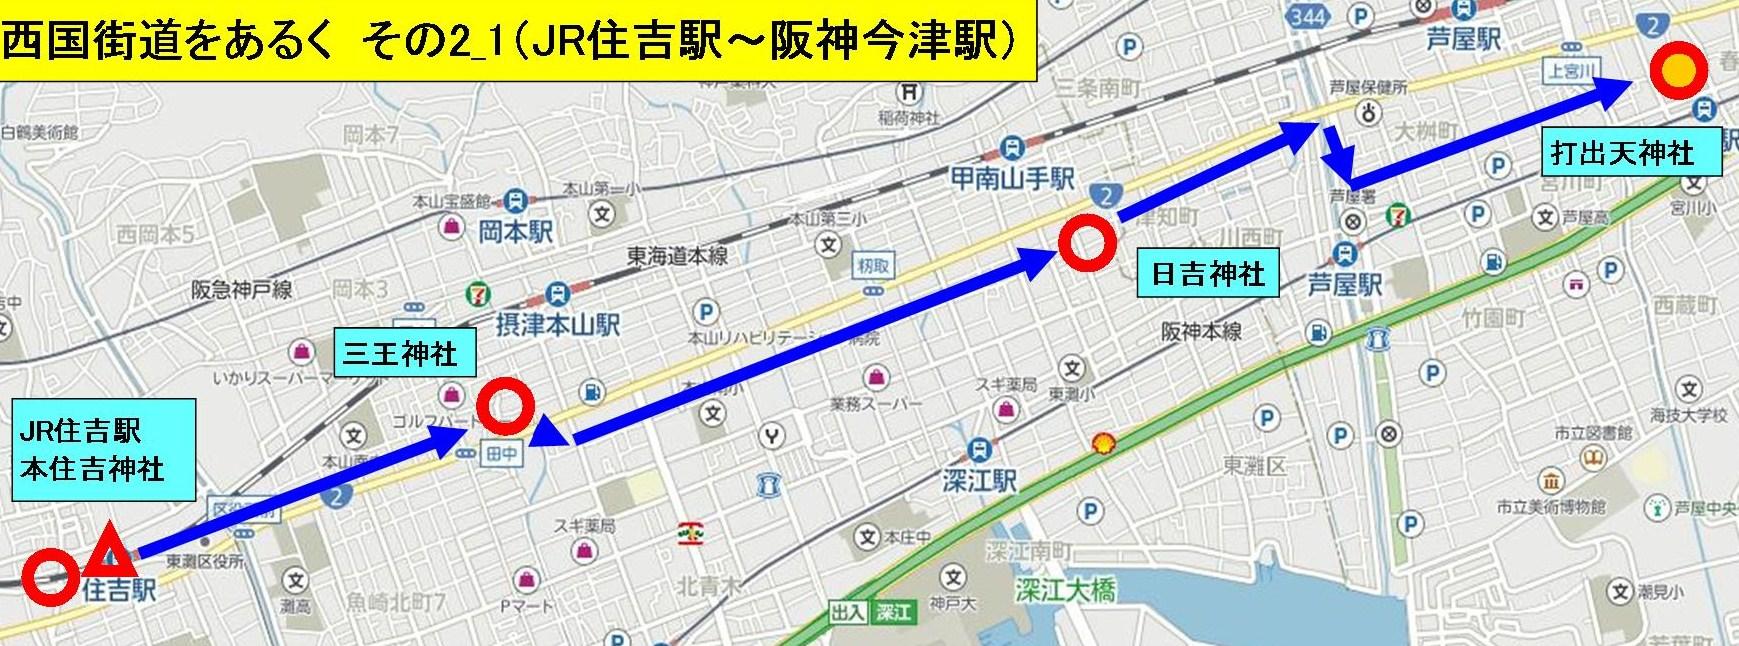 a地図block21.jpg